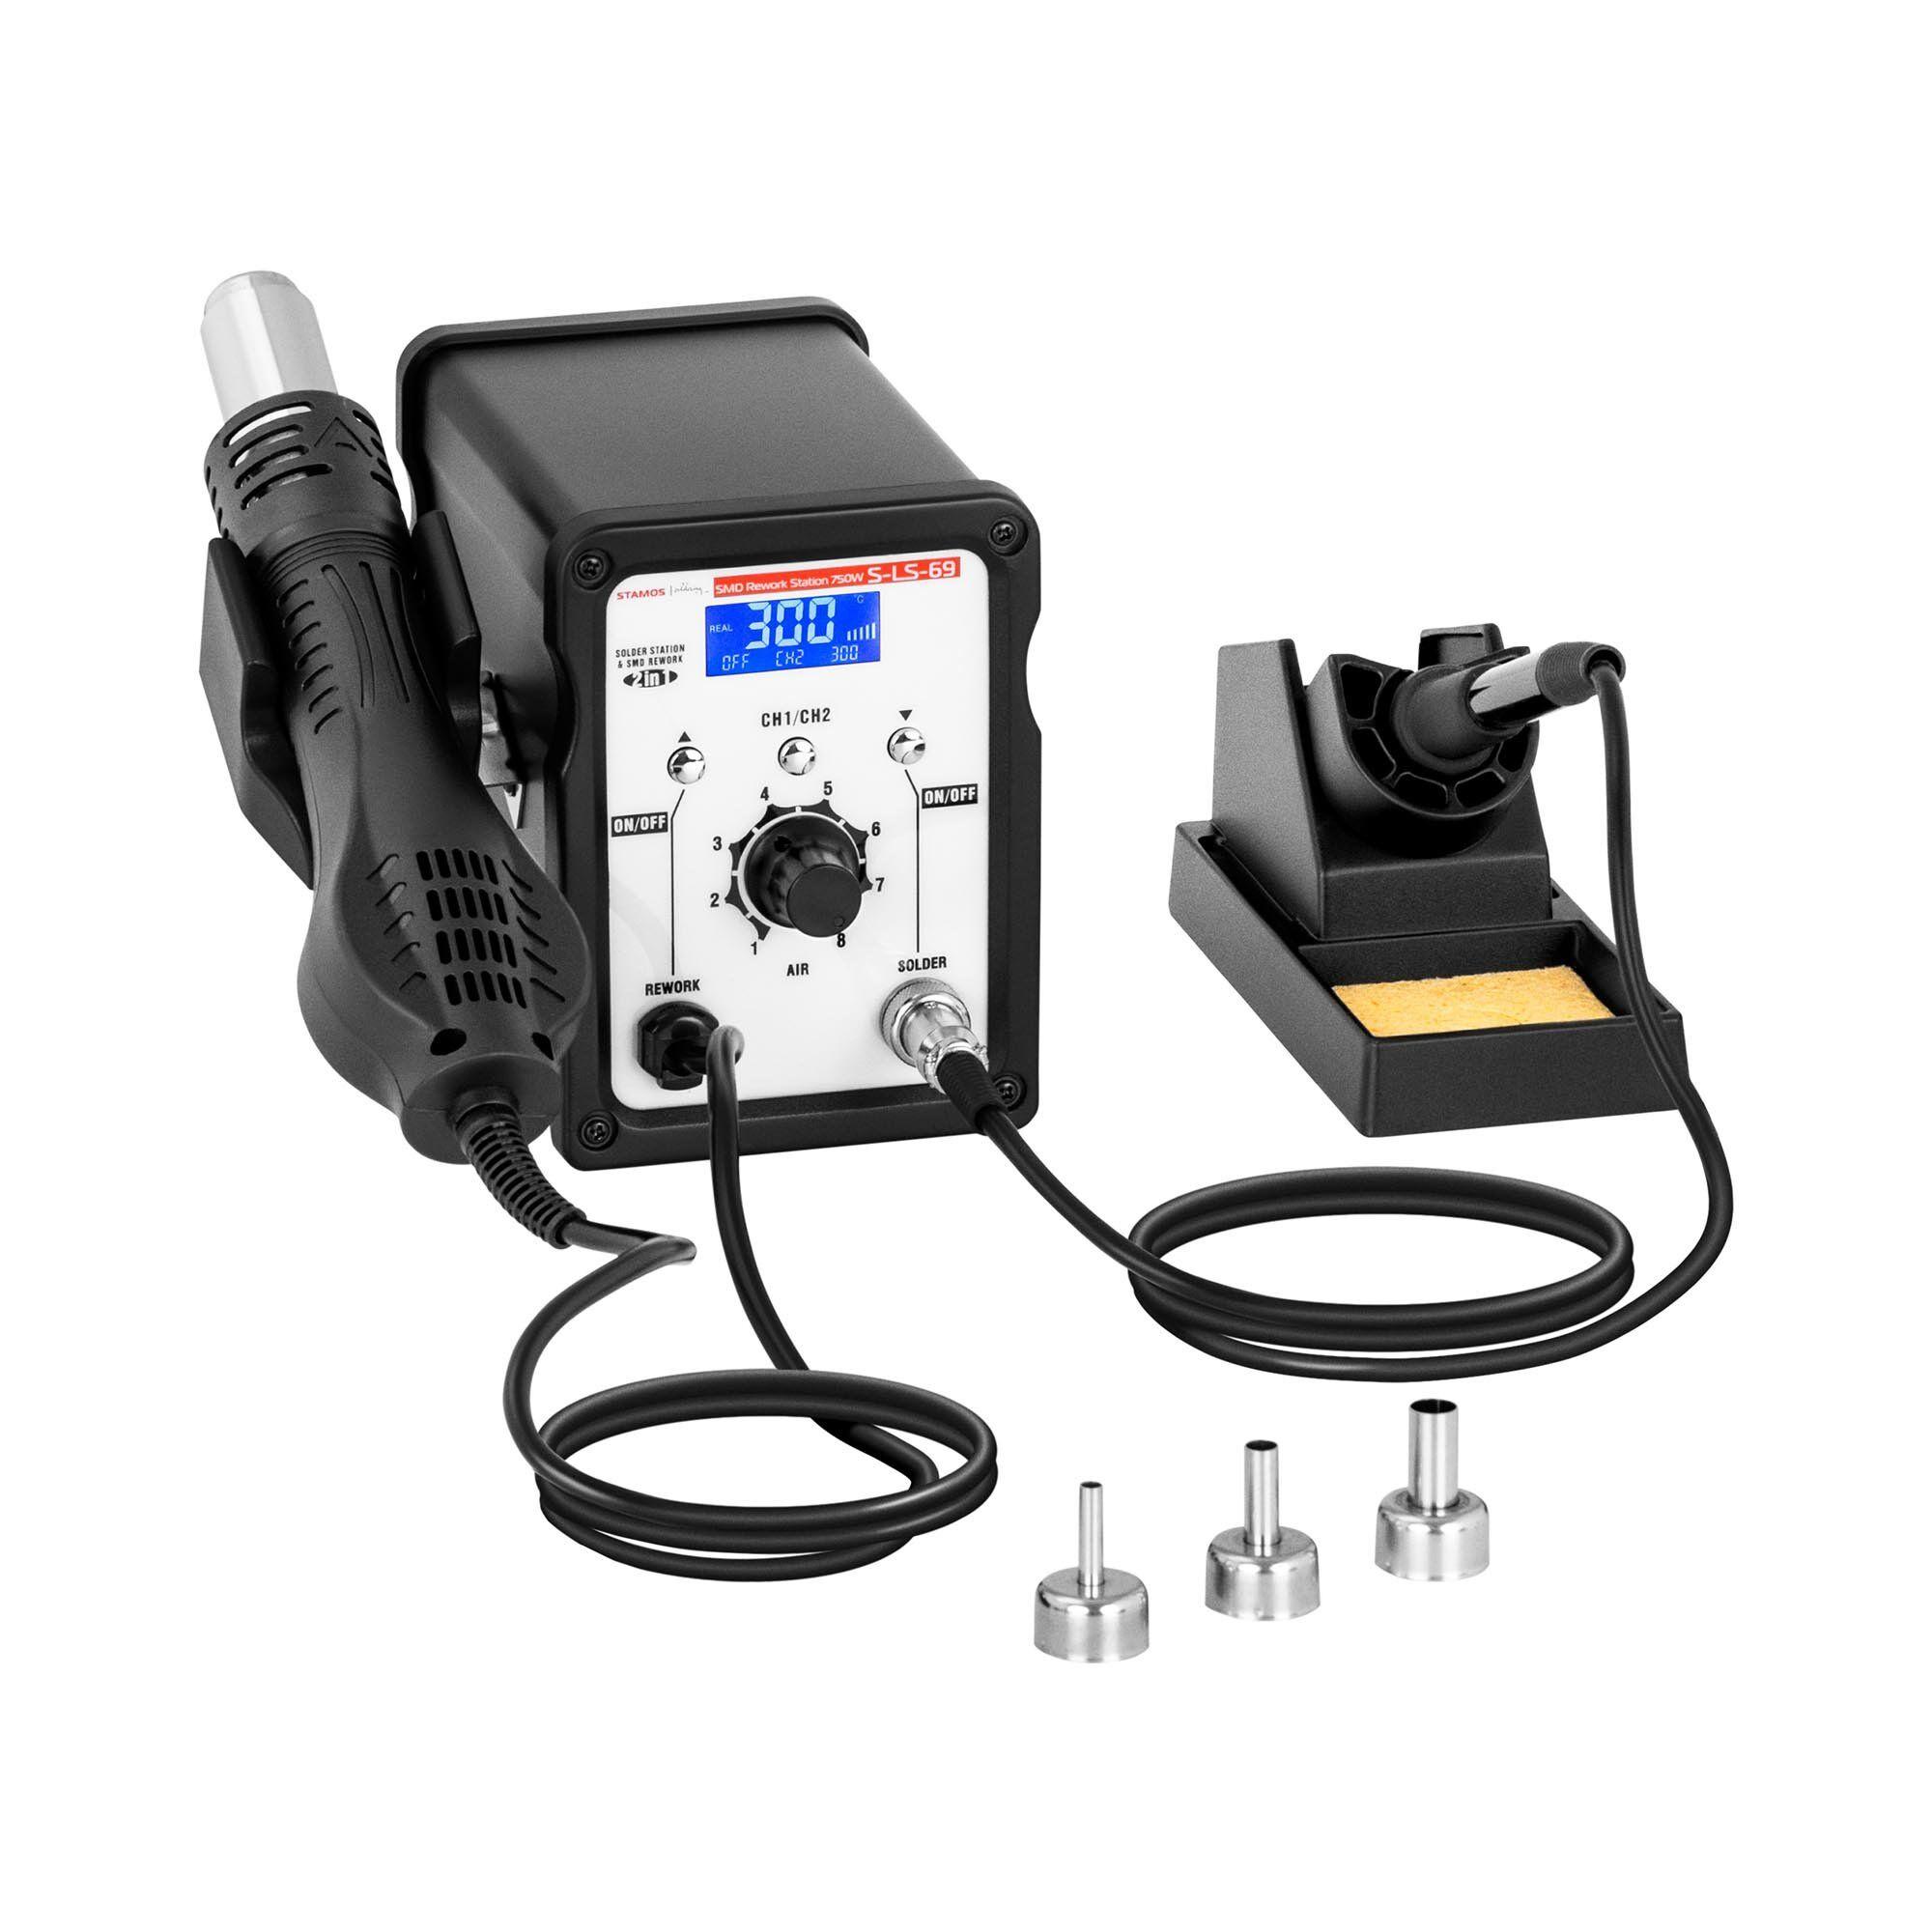 stamos soldering stazione saldante - stazione rework smd - con saldatore 50 w e saldatore ad aria calda 750 w s-ls-69